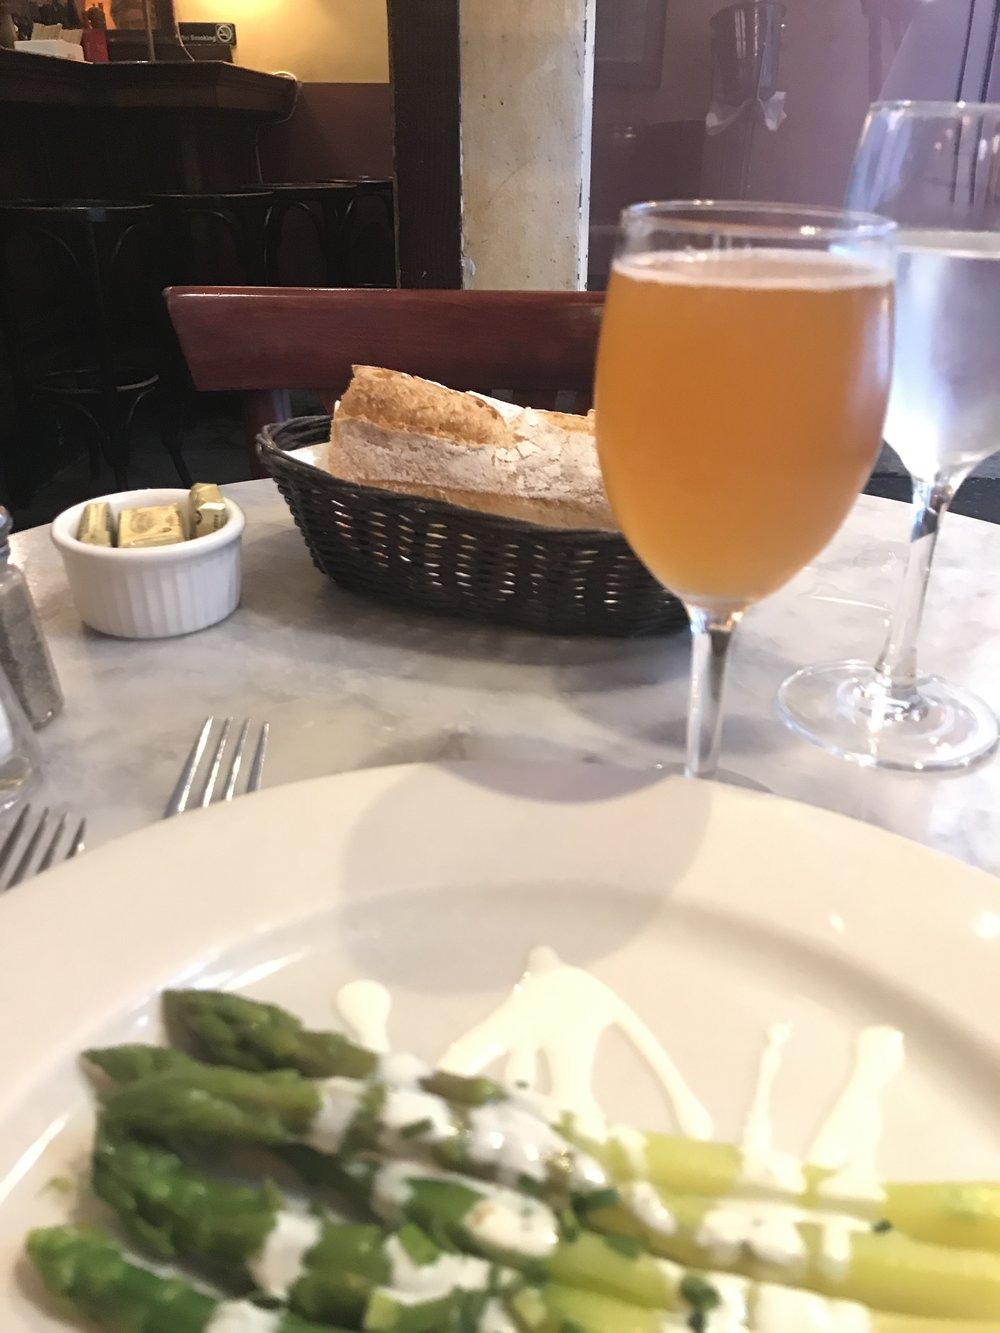 Asparagus vinaigrette and cidre.